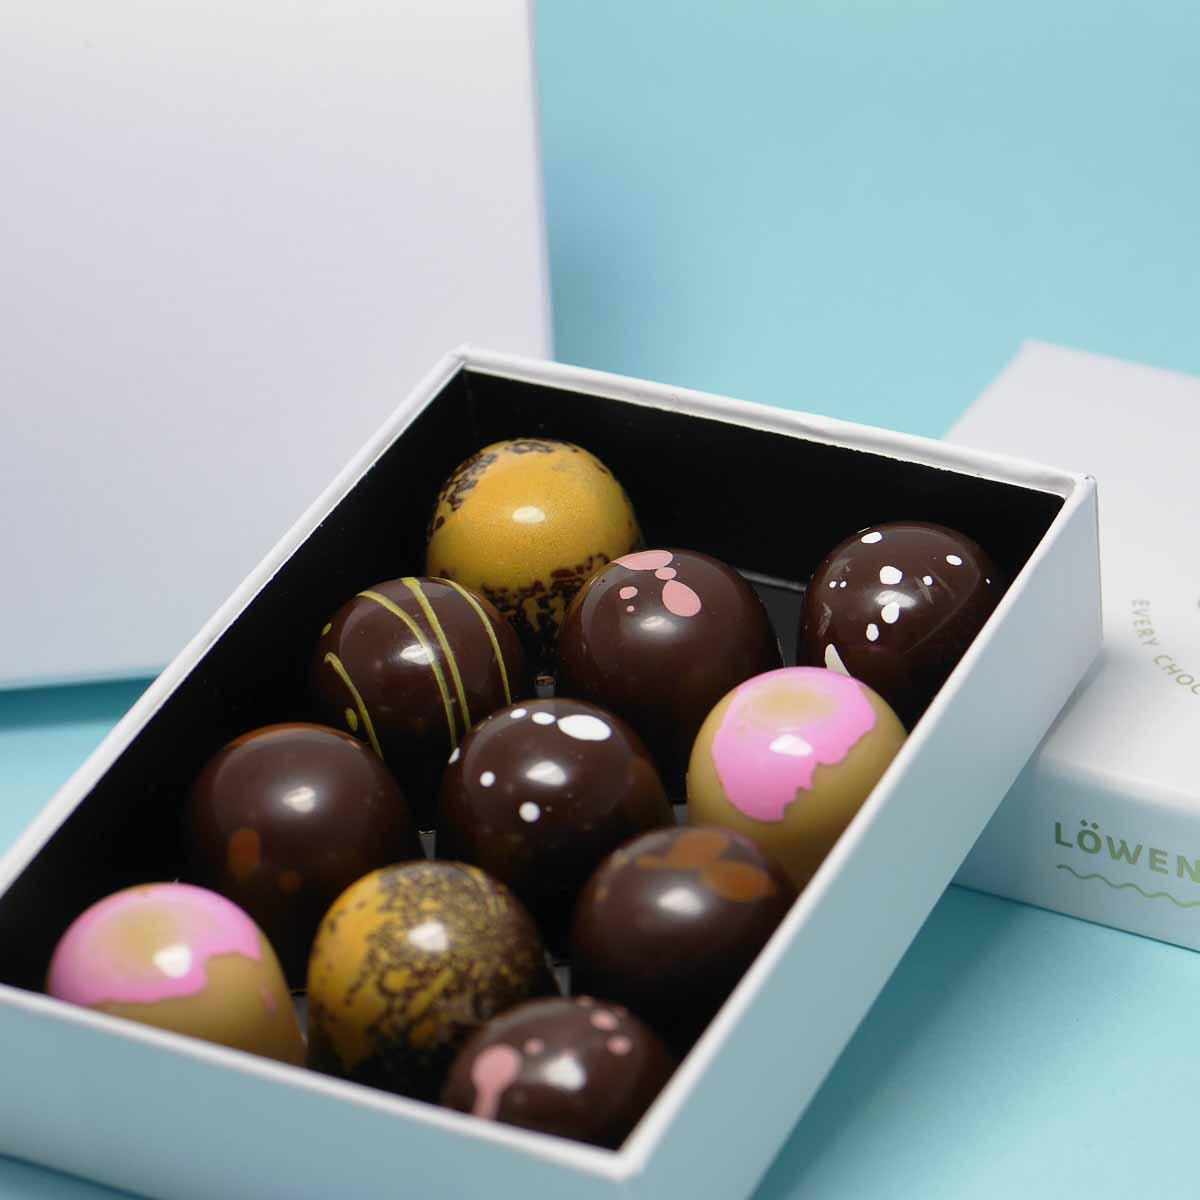 Löw Delights Gourmet Schokolade aus Zürich-9